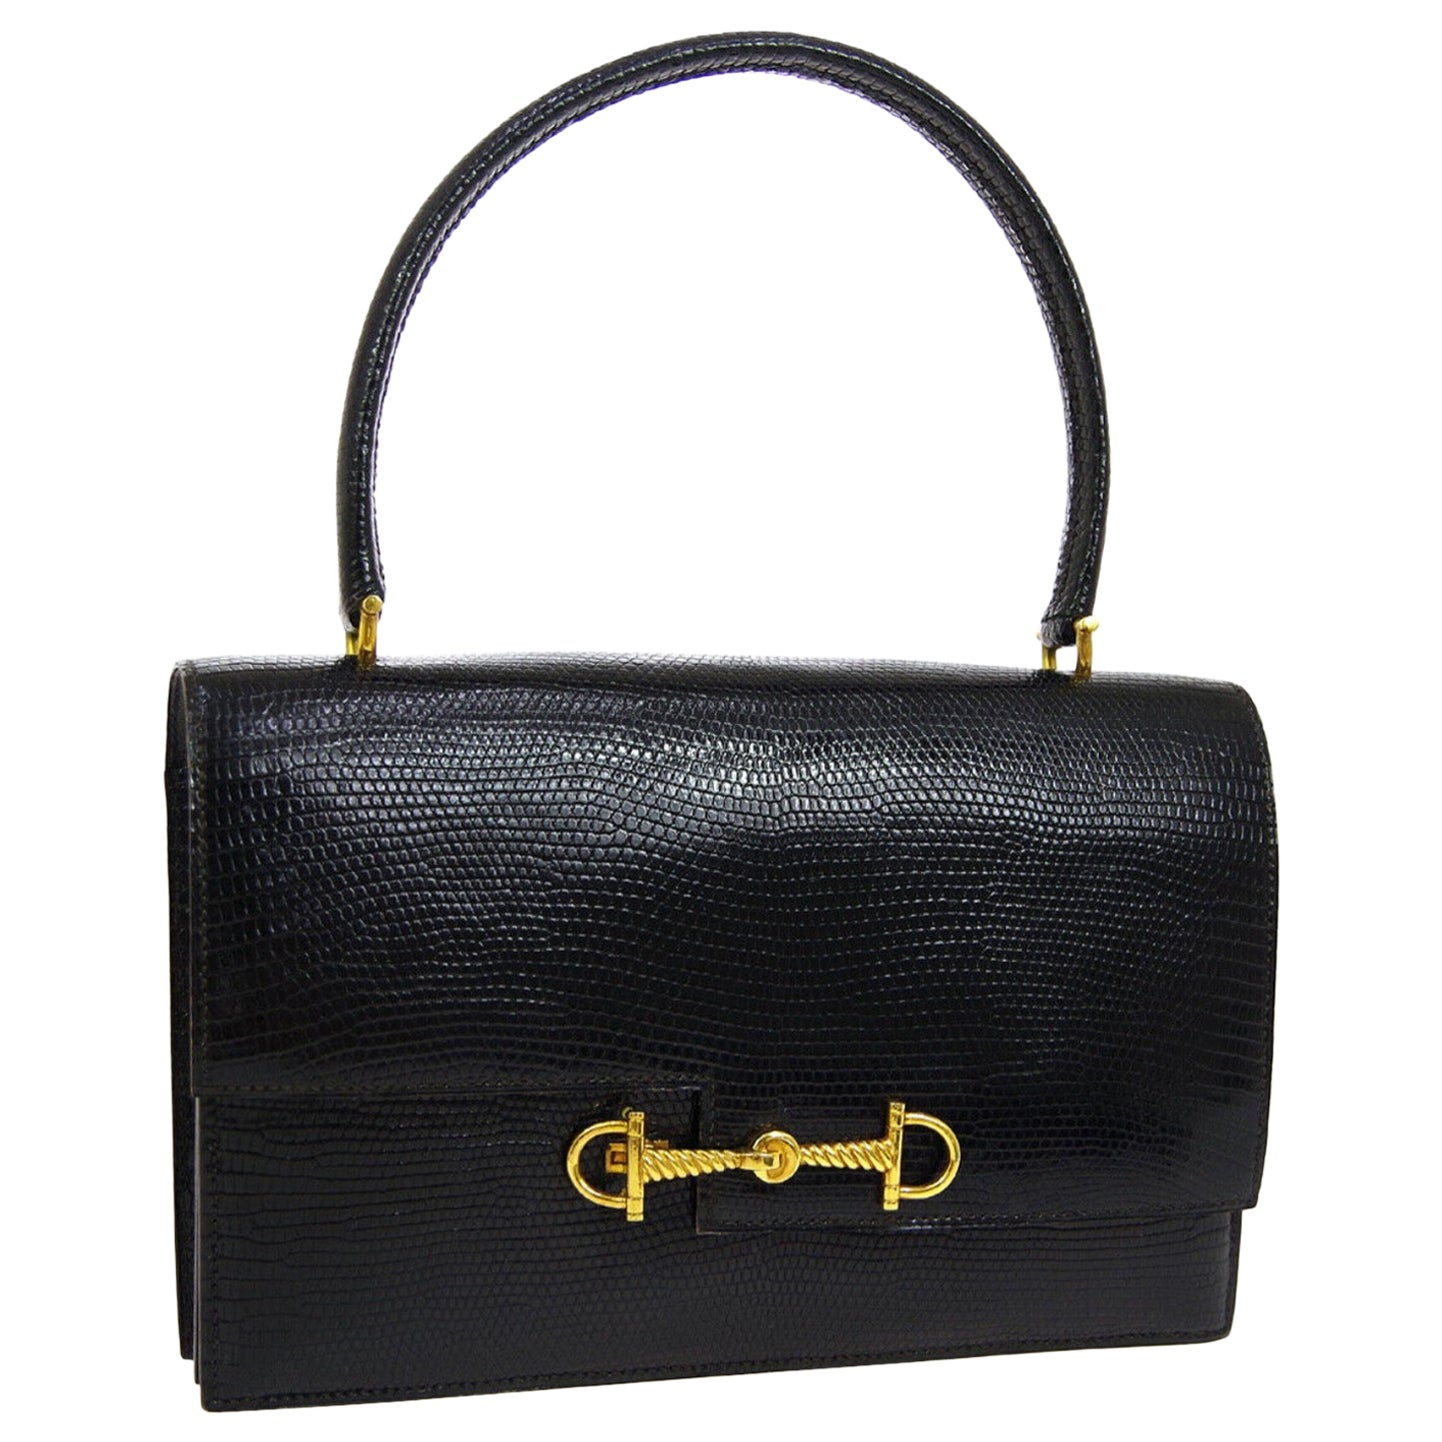 Hermes Black Exotic Lizard Gold Evening Kelly Style Top Handle Satchel Bag